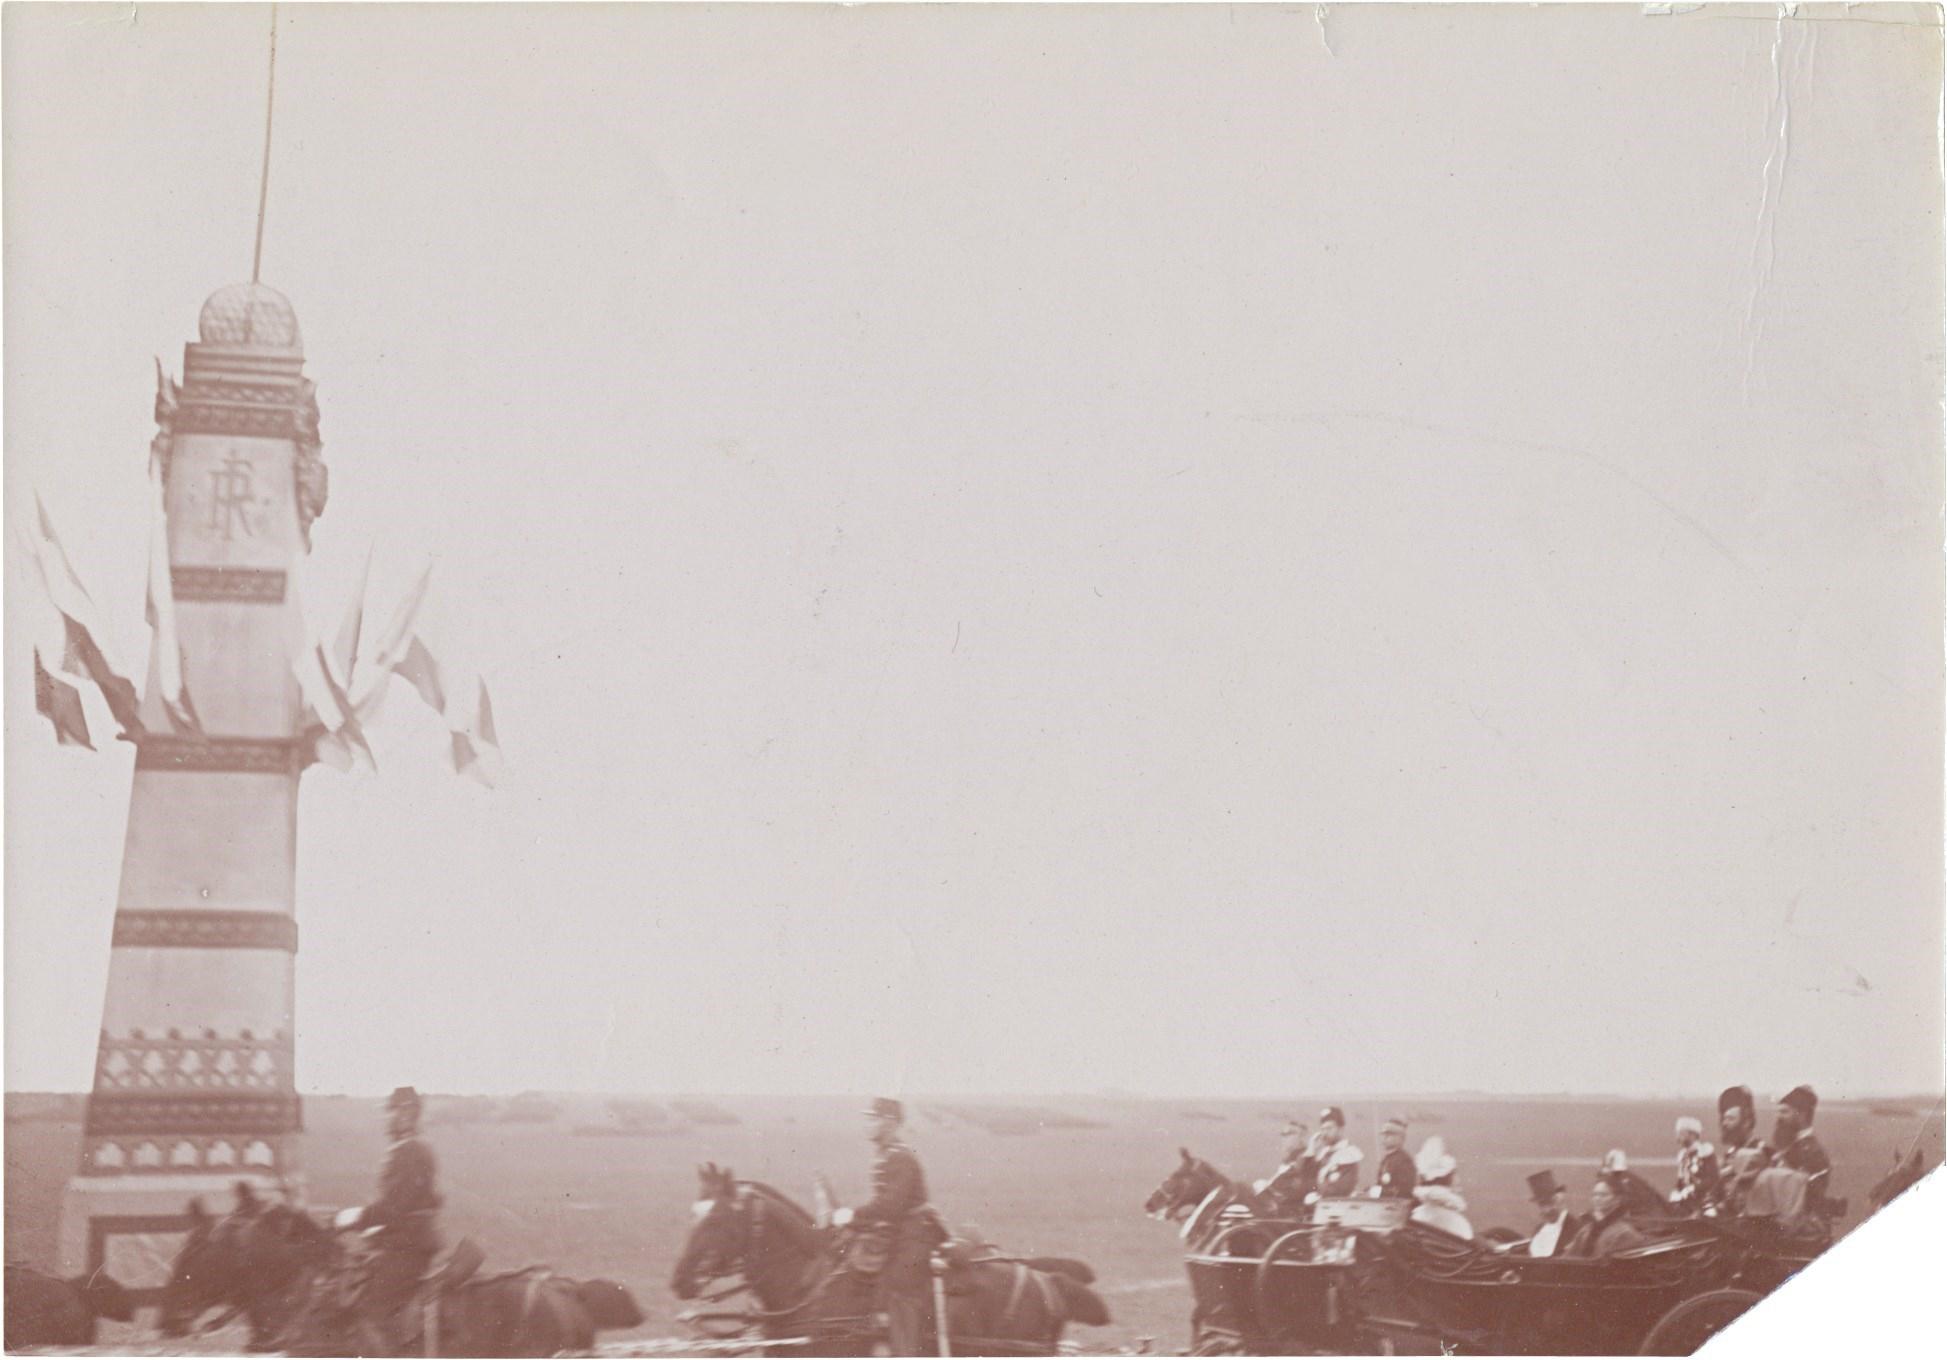 33. Французская кавалерия проходит маршем вслед за кортежем императора Николая II по улицам Парижа